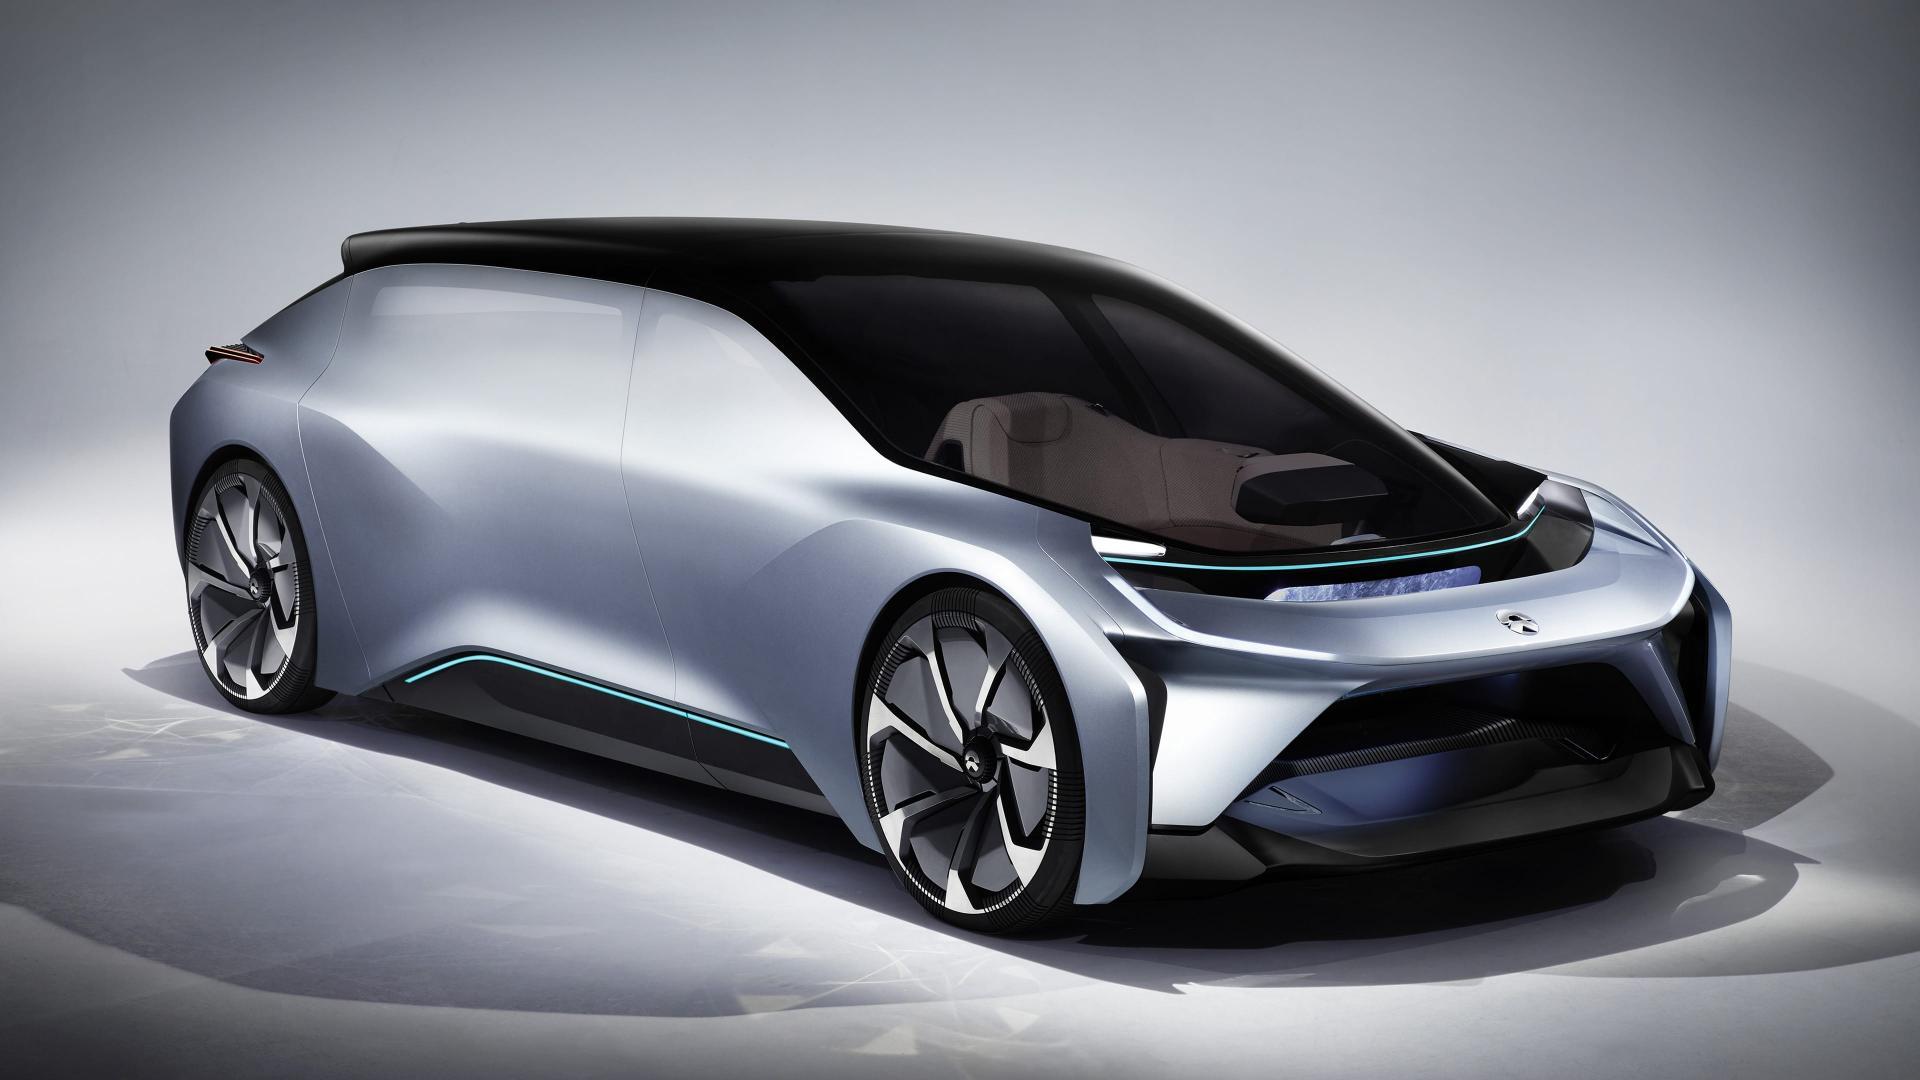 Nio Nio U S Electric Car In 2020 Electric Car Concept Future Concept Cars Car